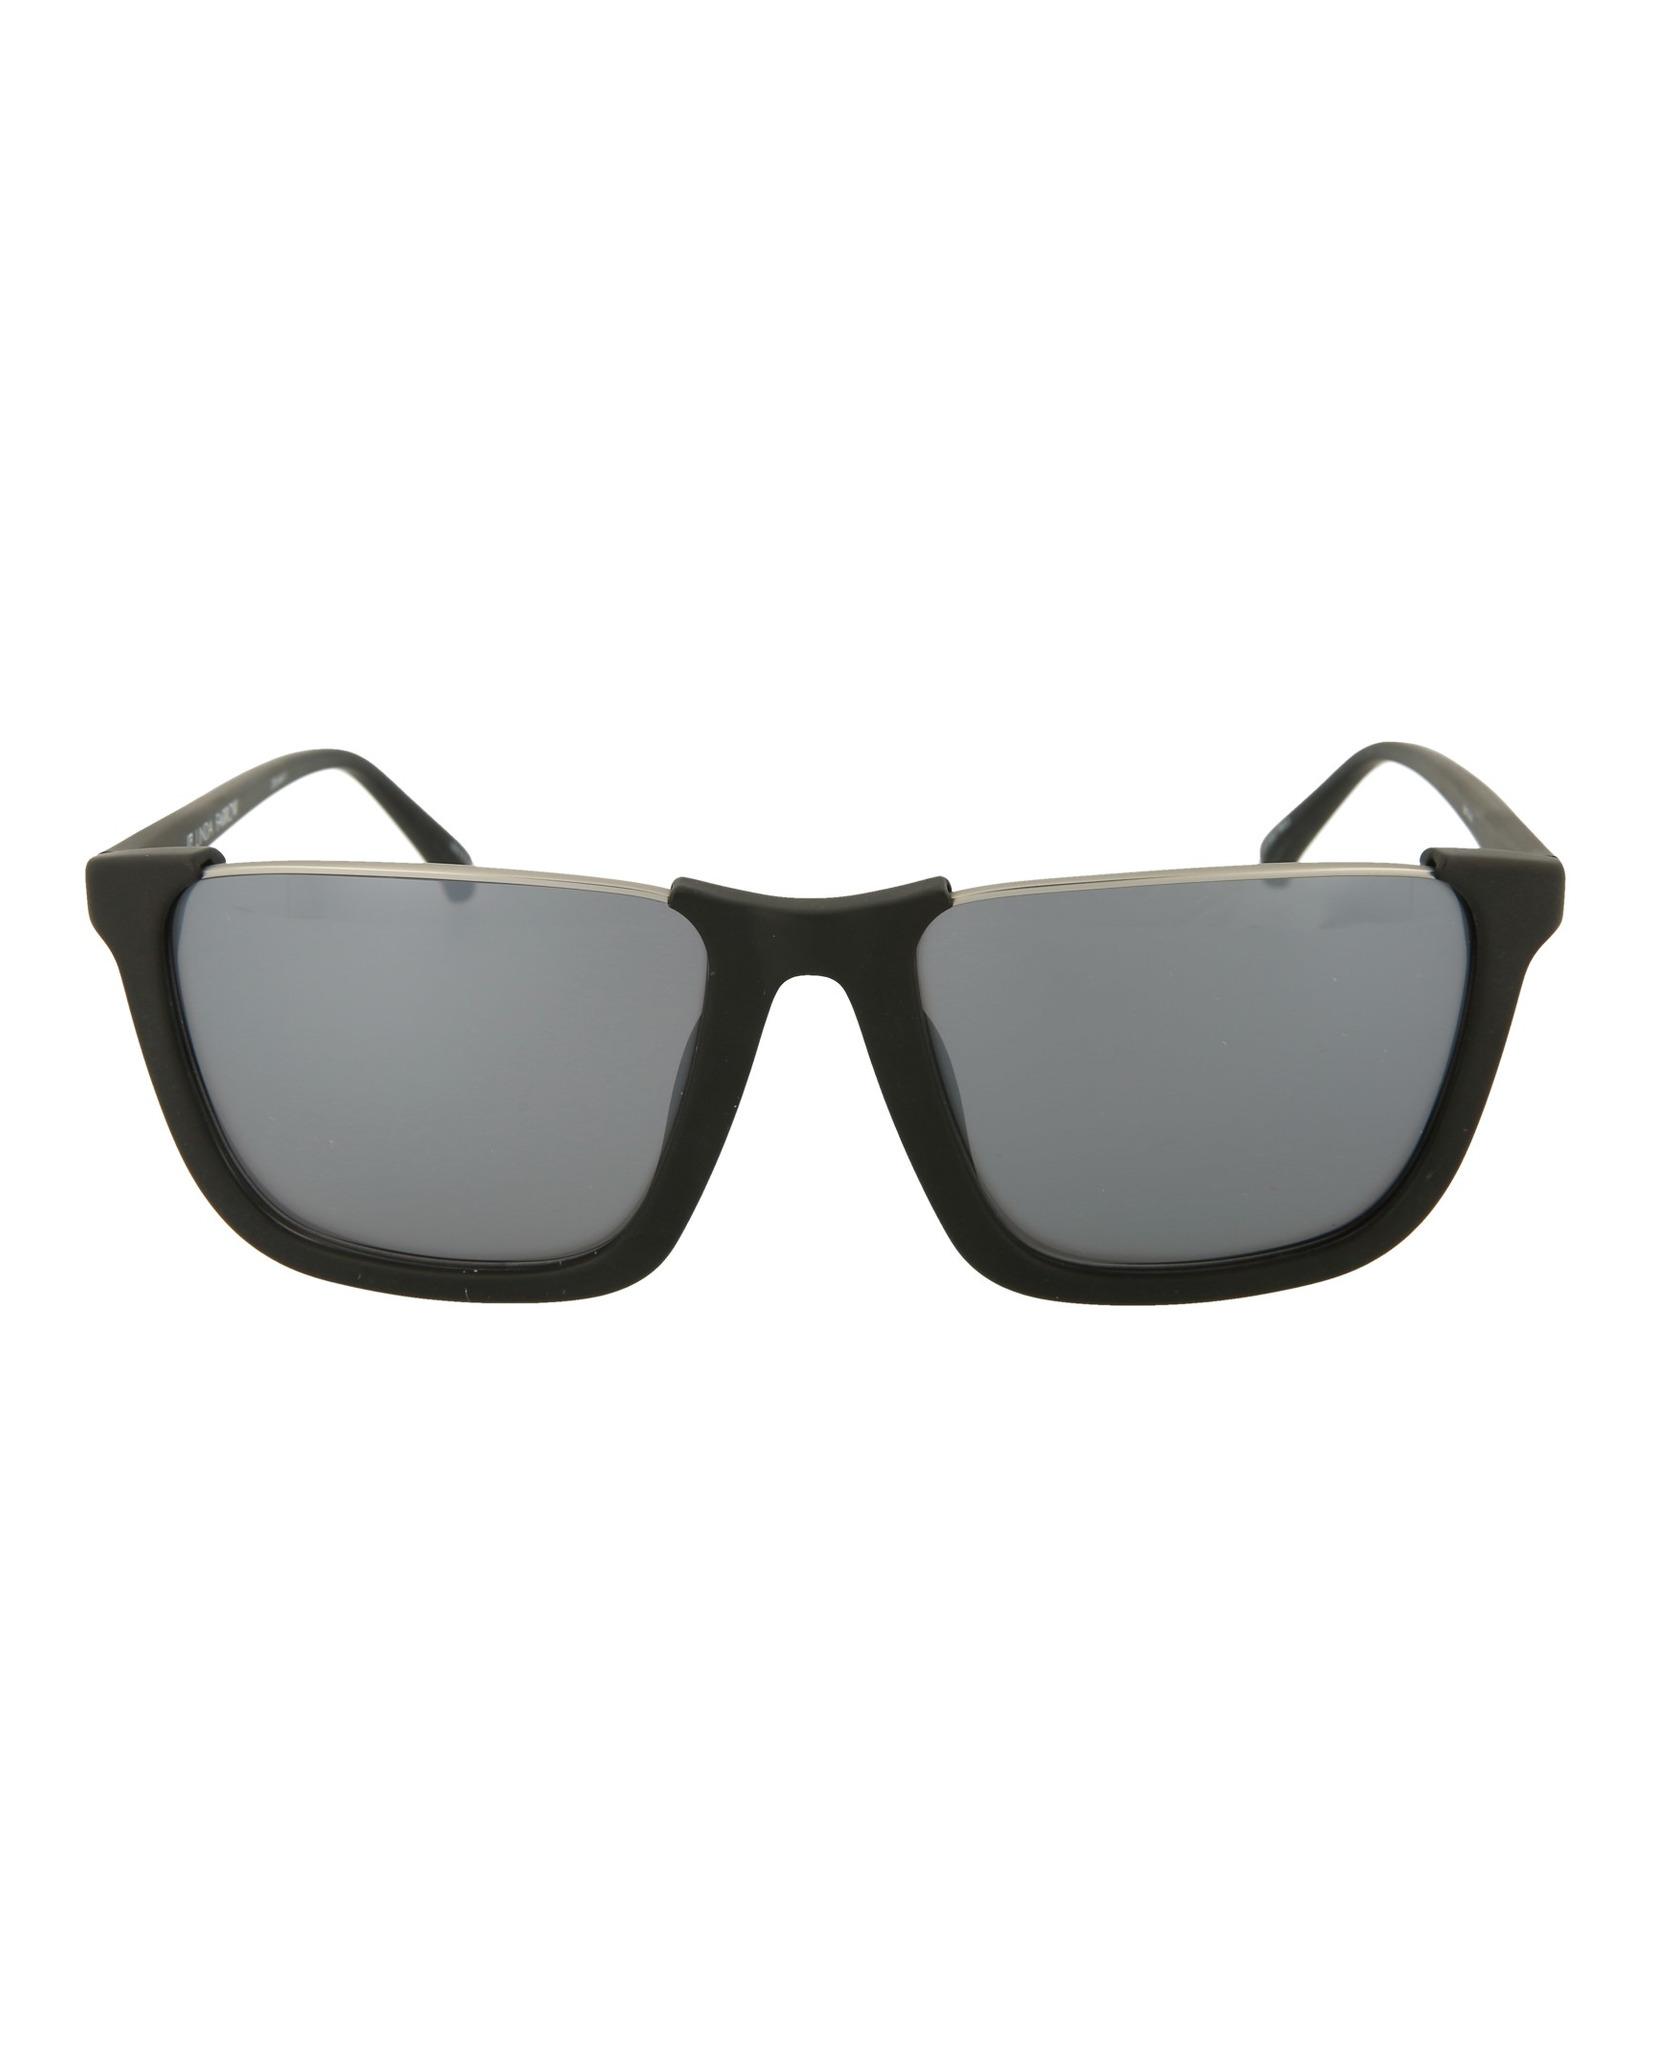 38c413b171f Image is loading Linda-Farrow-Womens-Square-Rectangle-Sunglasses -LFL449C3-SUN